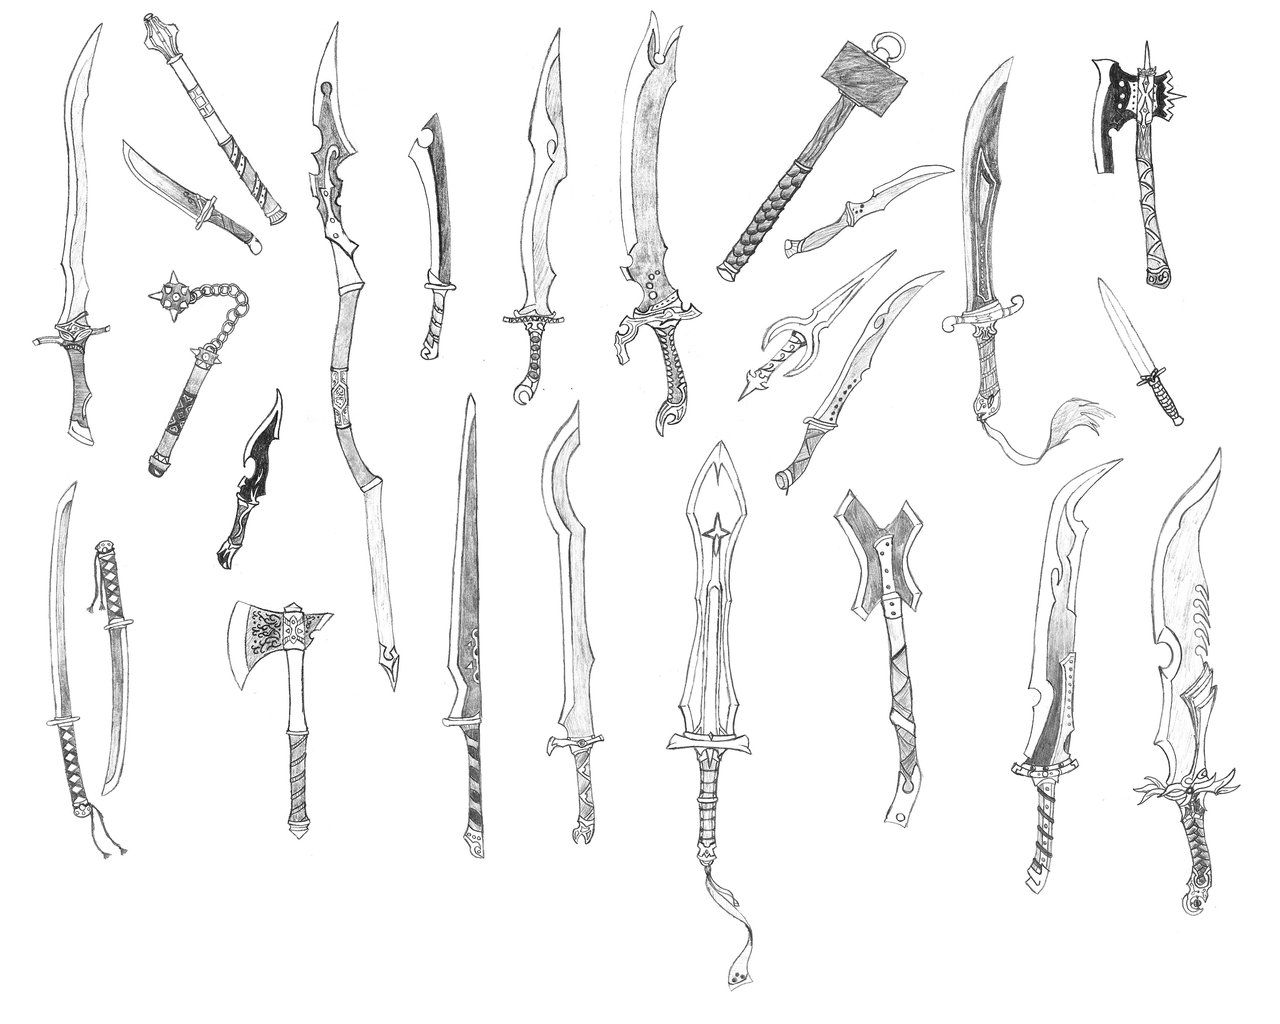 Random Weapons 3 by Bladedog.deviantart.com on @DeviantArt ...